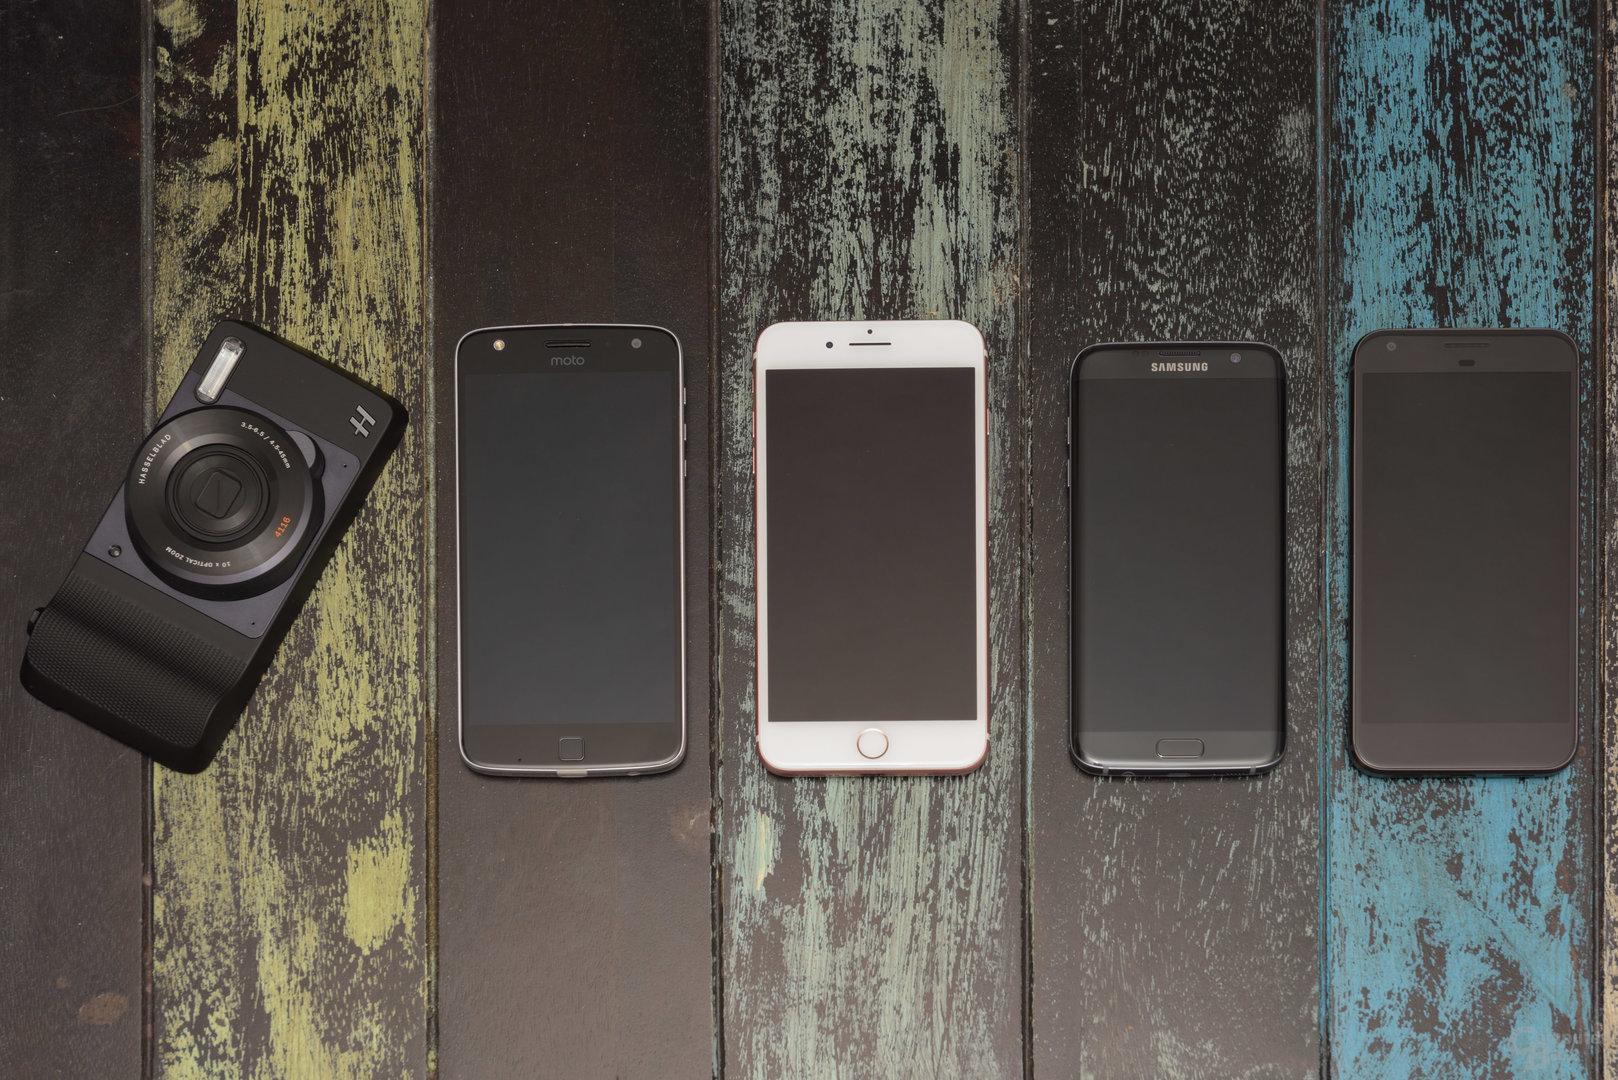 Google Pixel XL, iPhone 7 Plus, Samsung Galaxy S7 Edge, Lenovo Moto Z Play und Hasselblad True Zoom nebeneinander